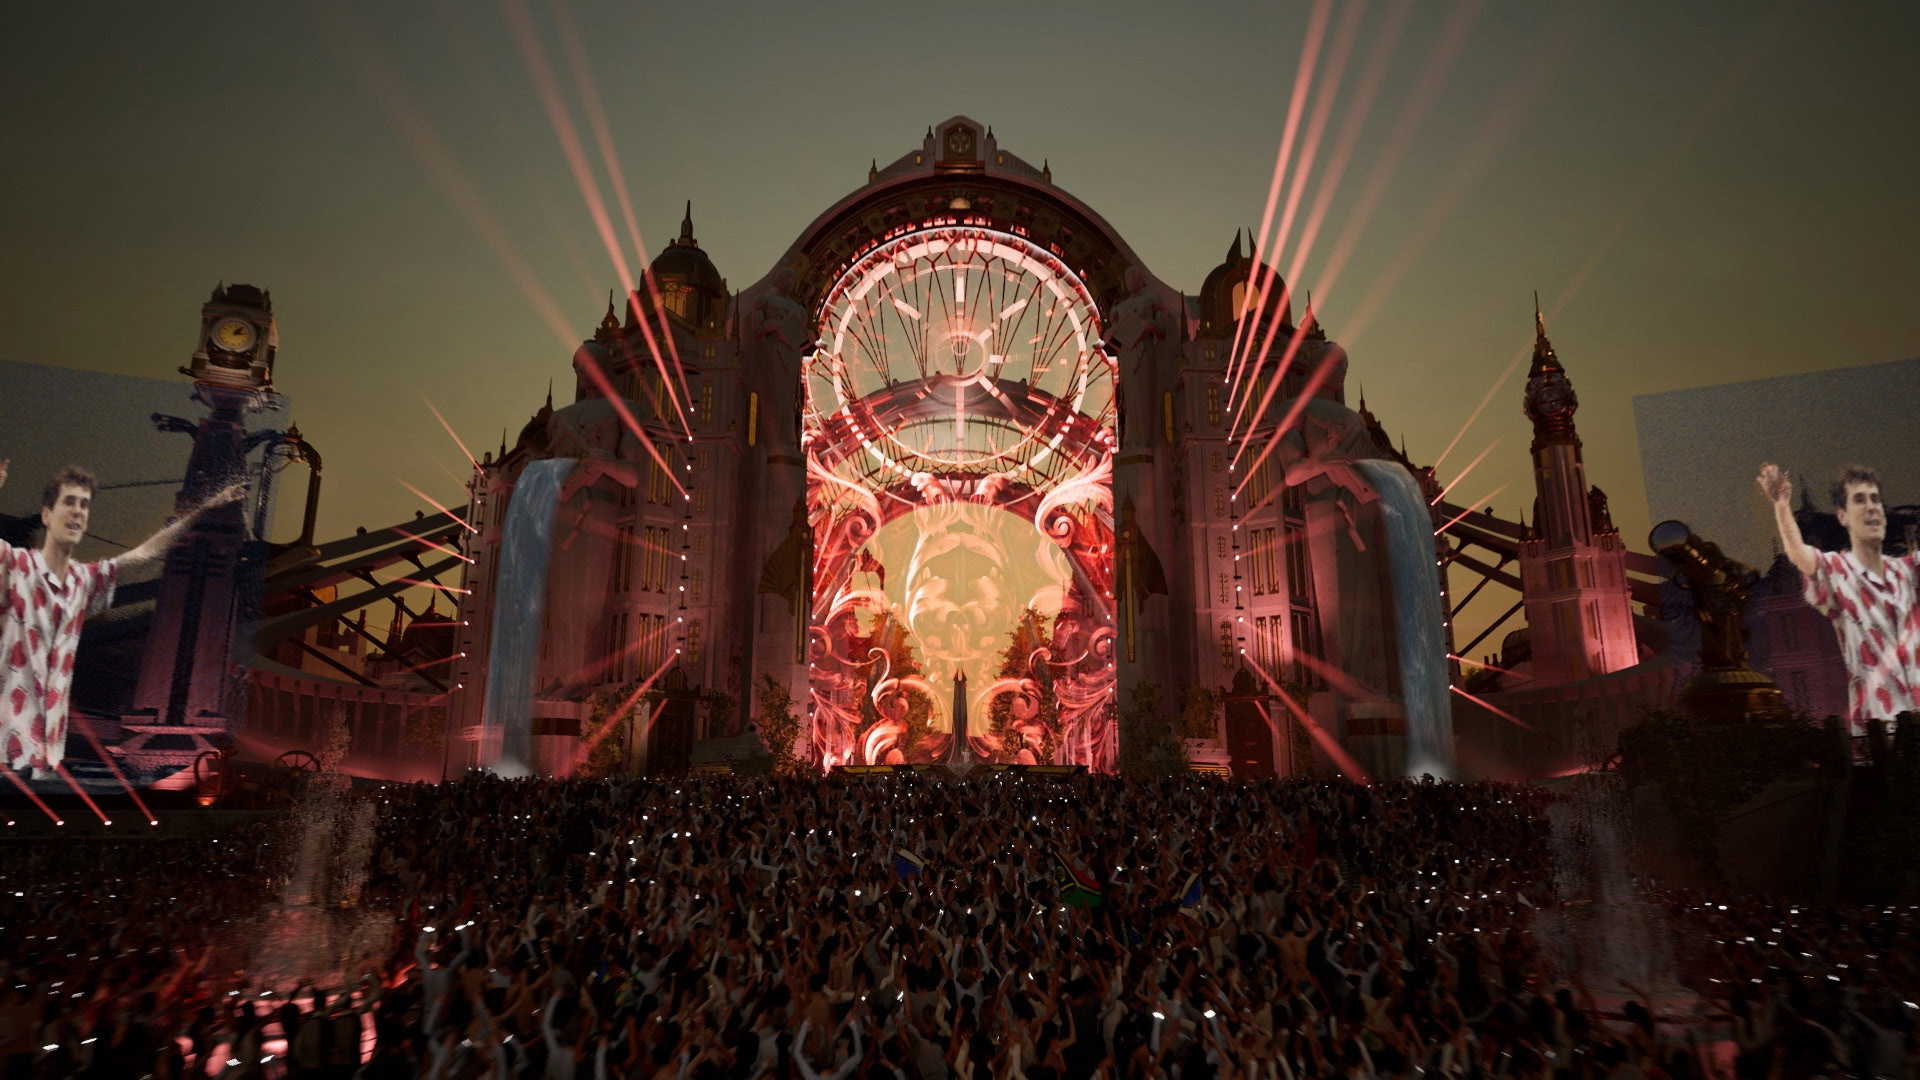 Tomorrowland offers a glimpse into his festival